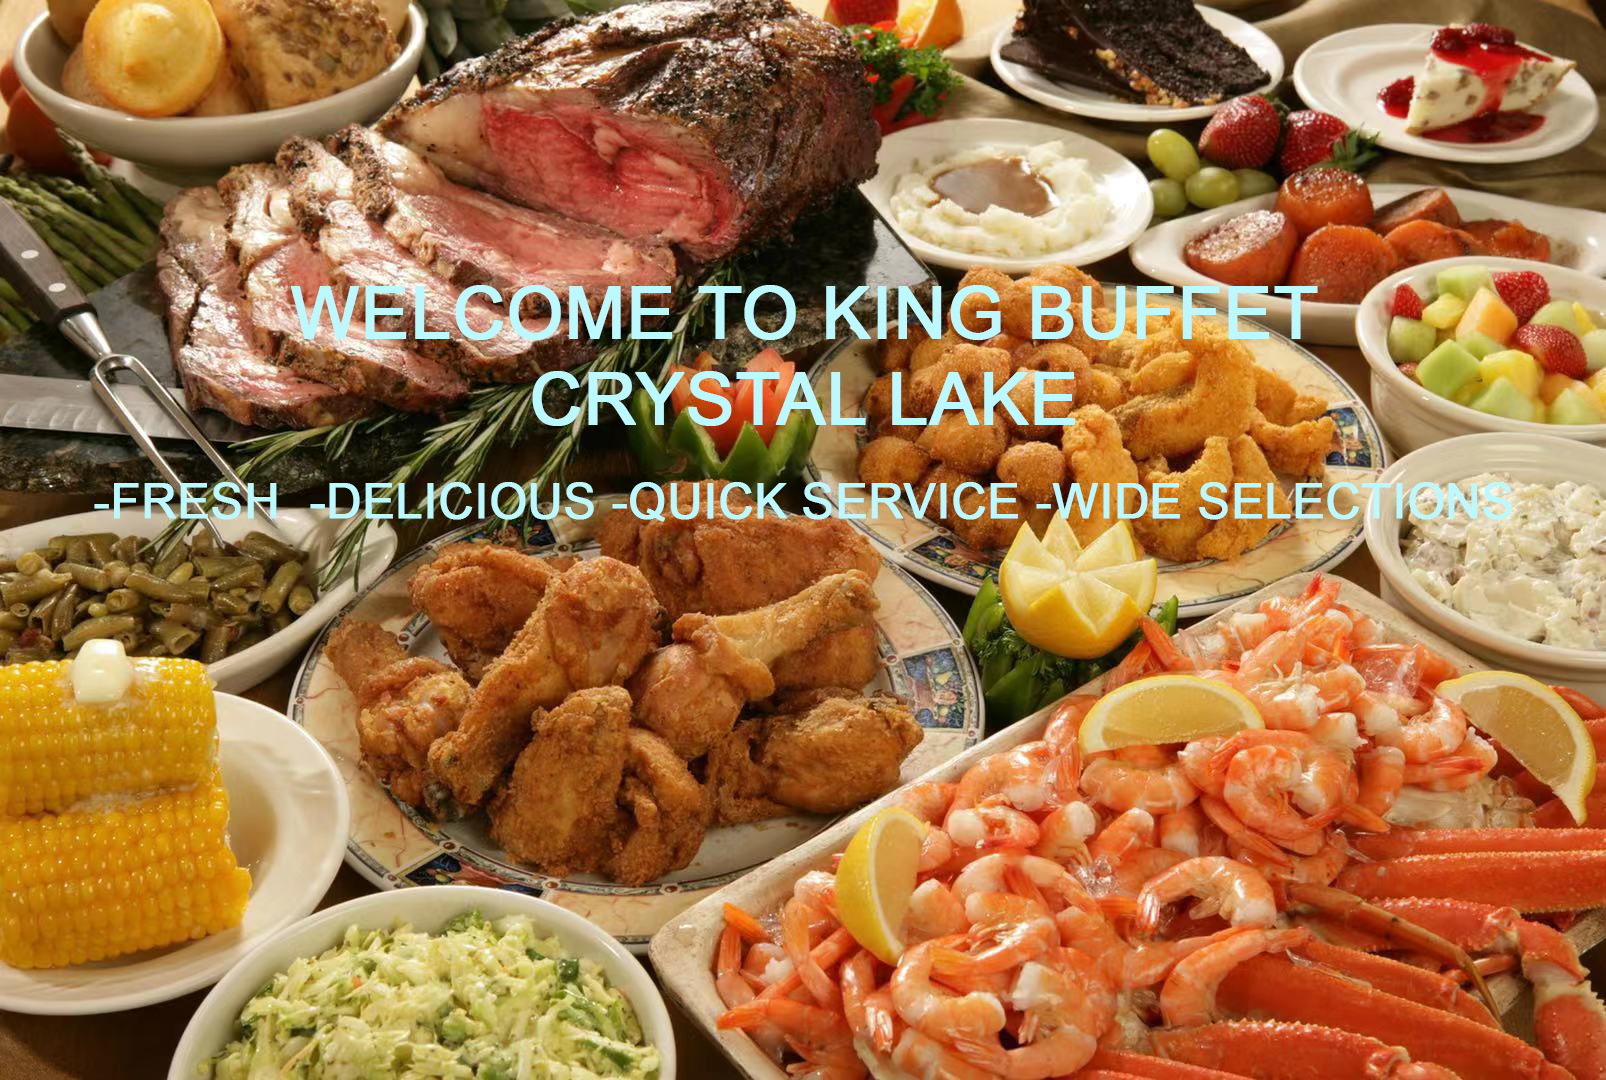 KING BUFFET CRYSTAL LAKE